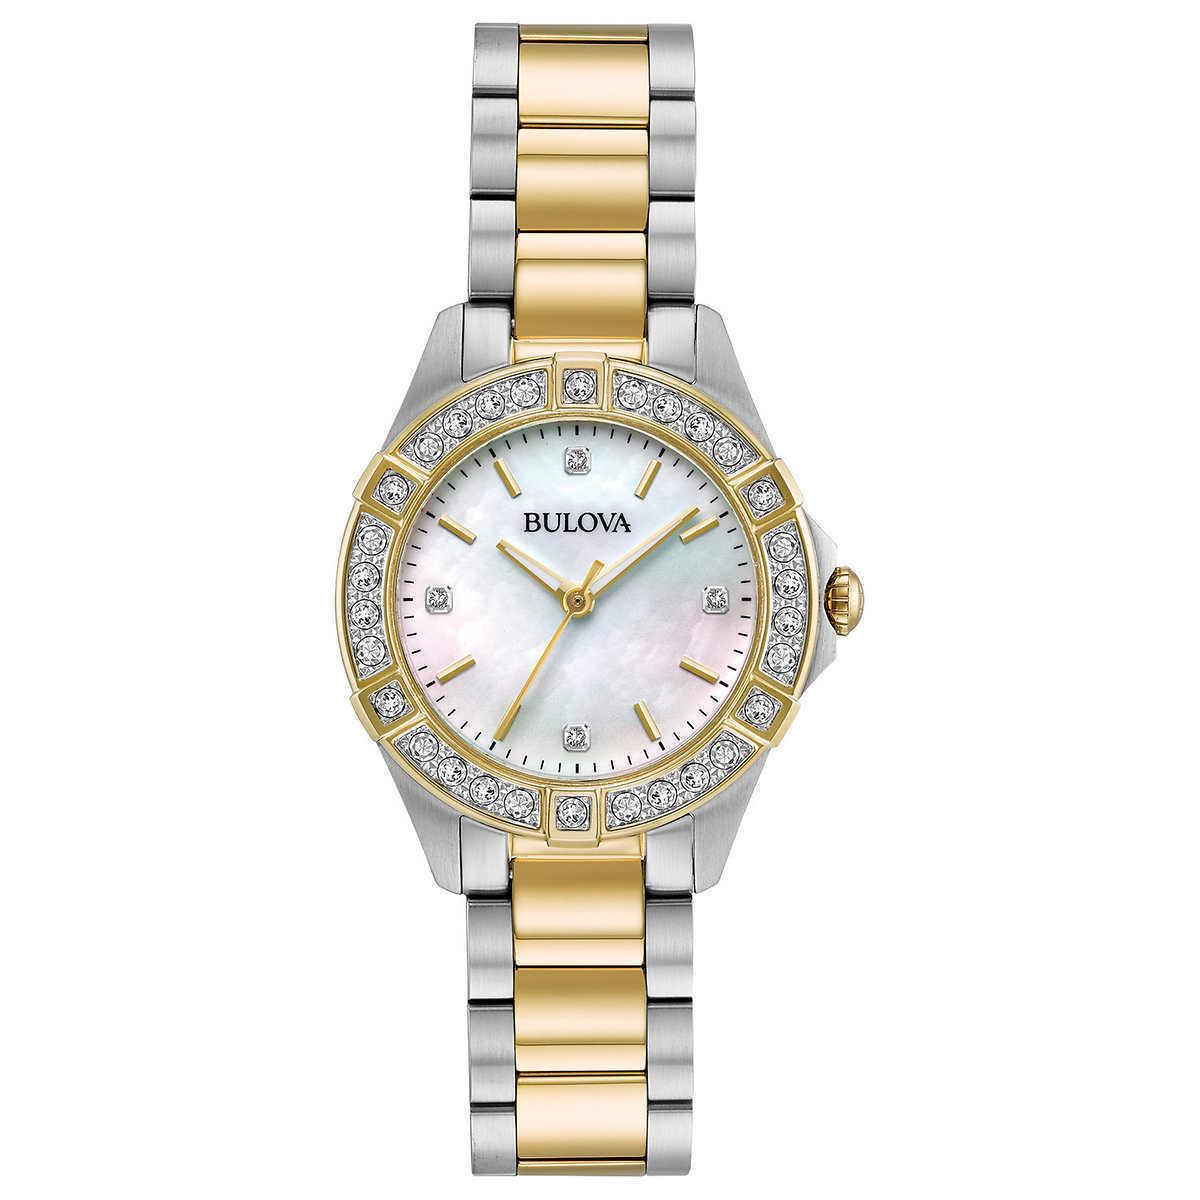 Bulova 22 Diamond Two-Tone Stainless Steel MOP Dial Ladies Watch 98R236